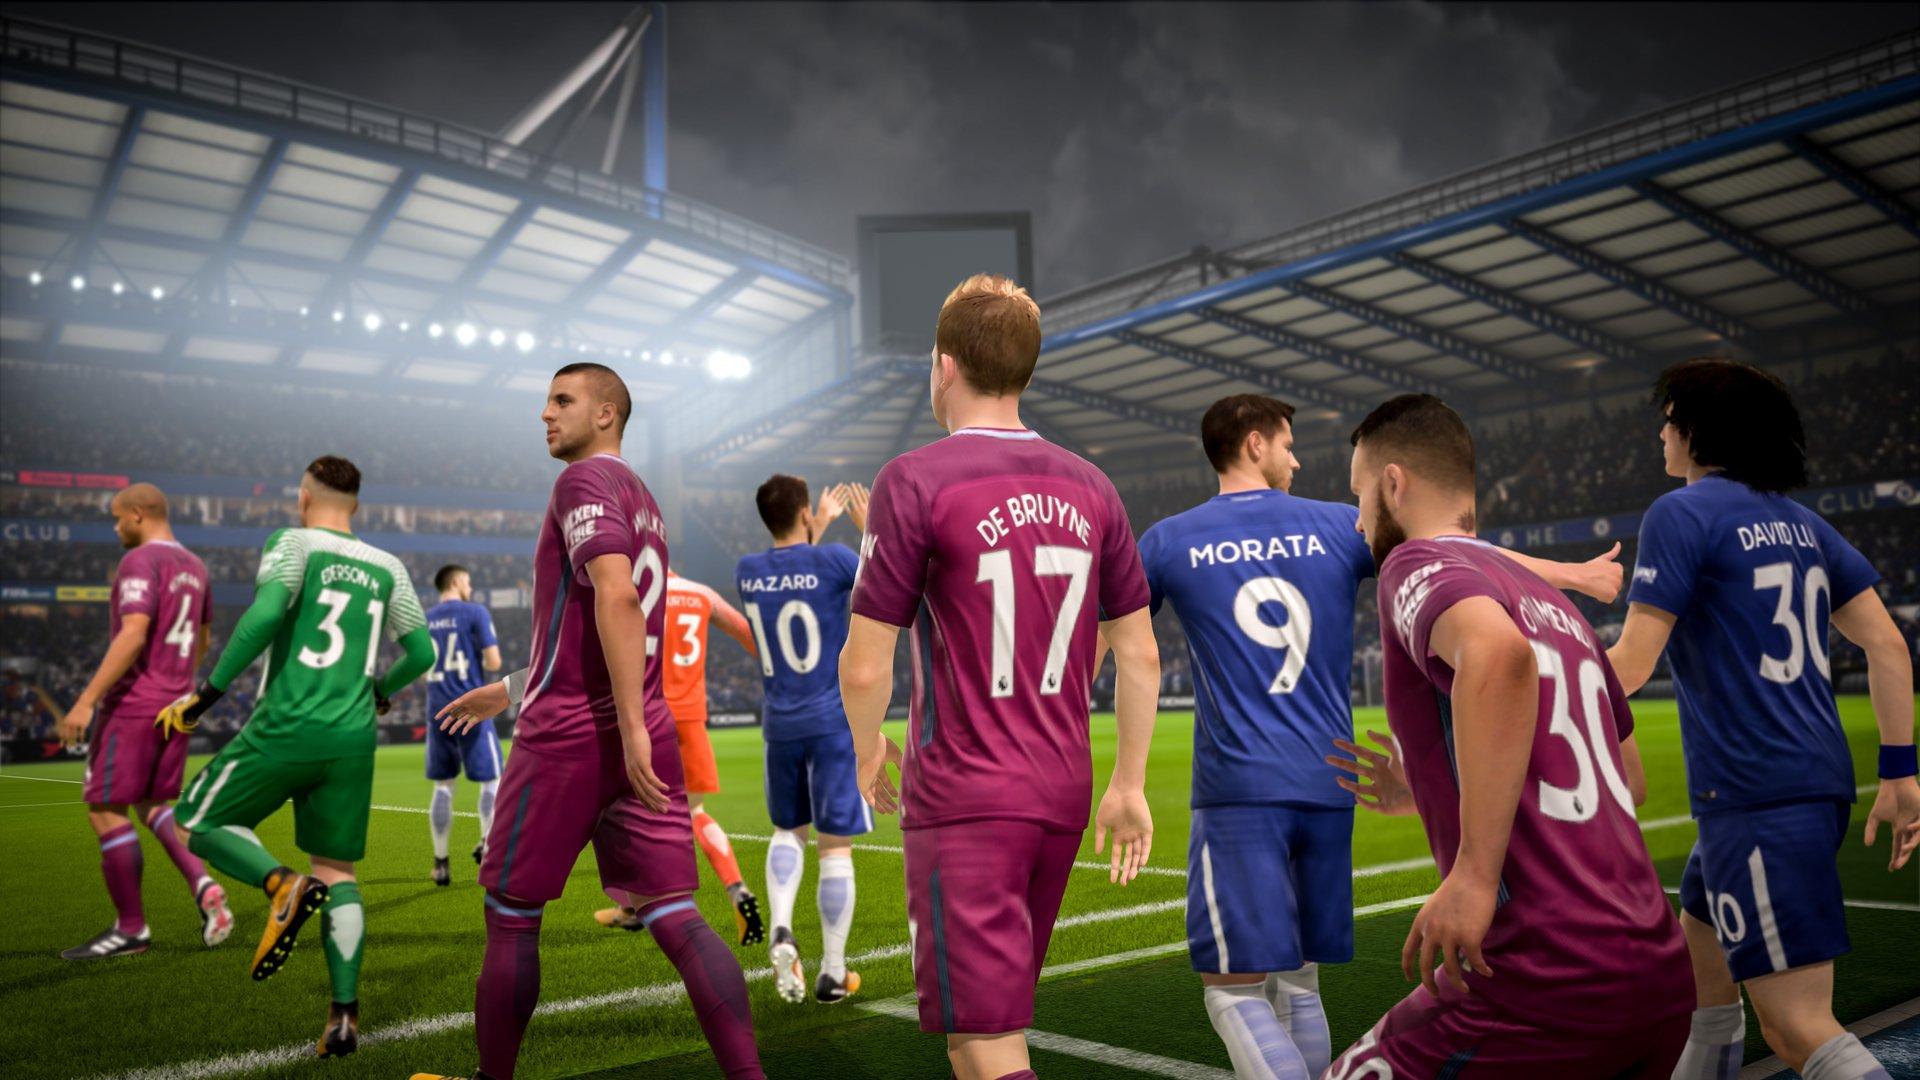 Fifa13 Messi2 Fifa15 Xboxone Ps4 Turkeysuperlig Besiktas Vs Trabzonspor Wm IMG 0100 568x426 Fifa 18 Chelsea